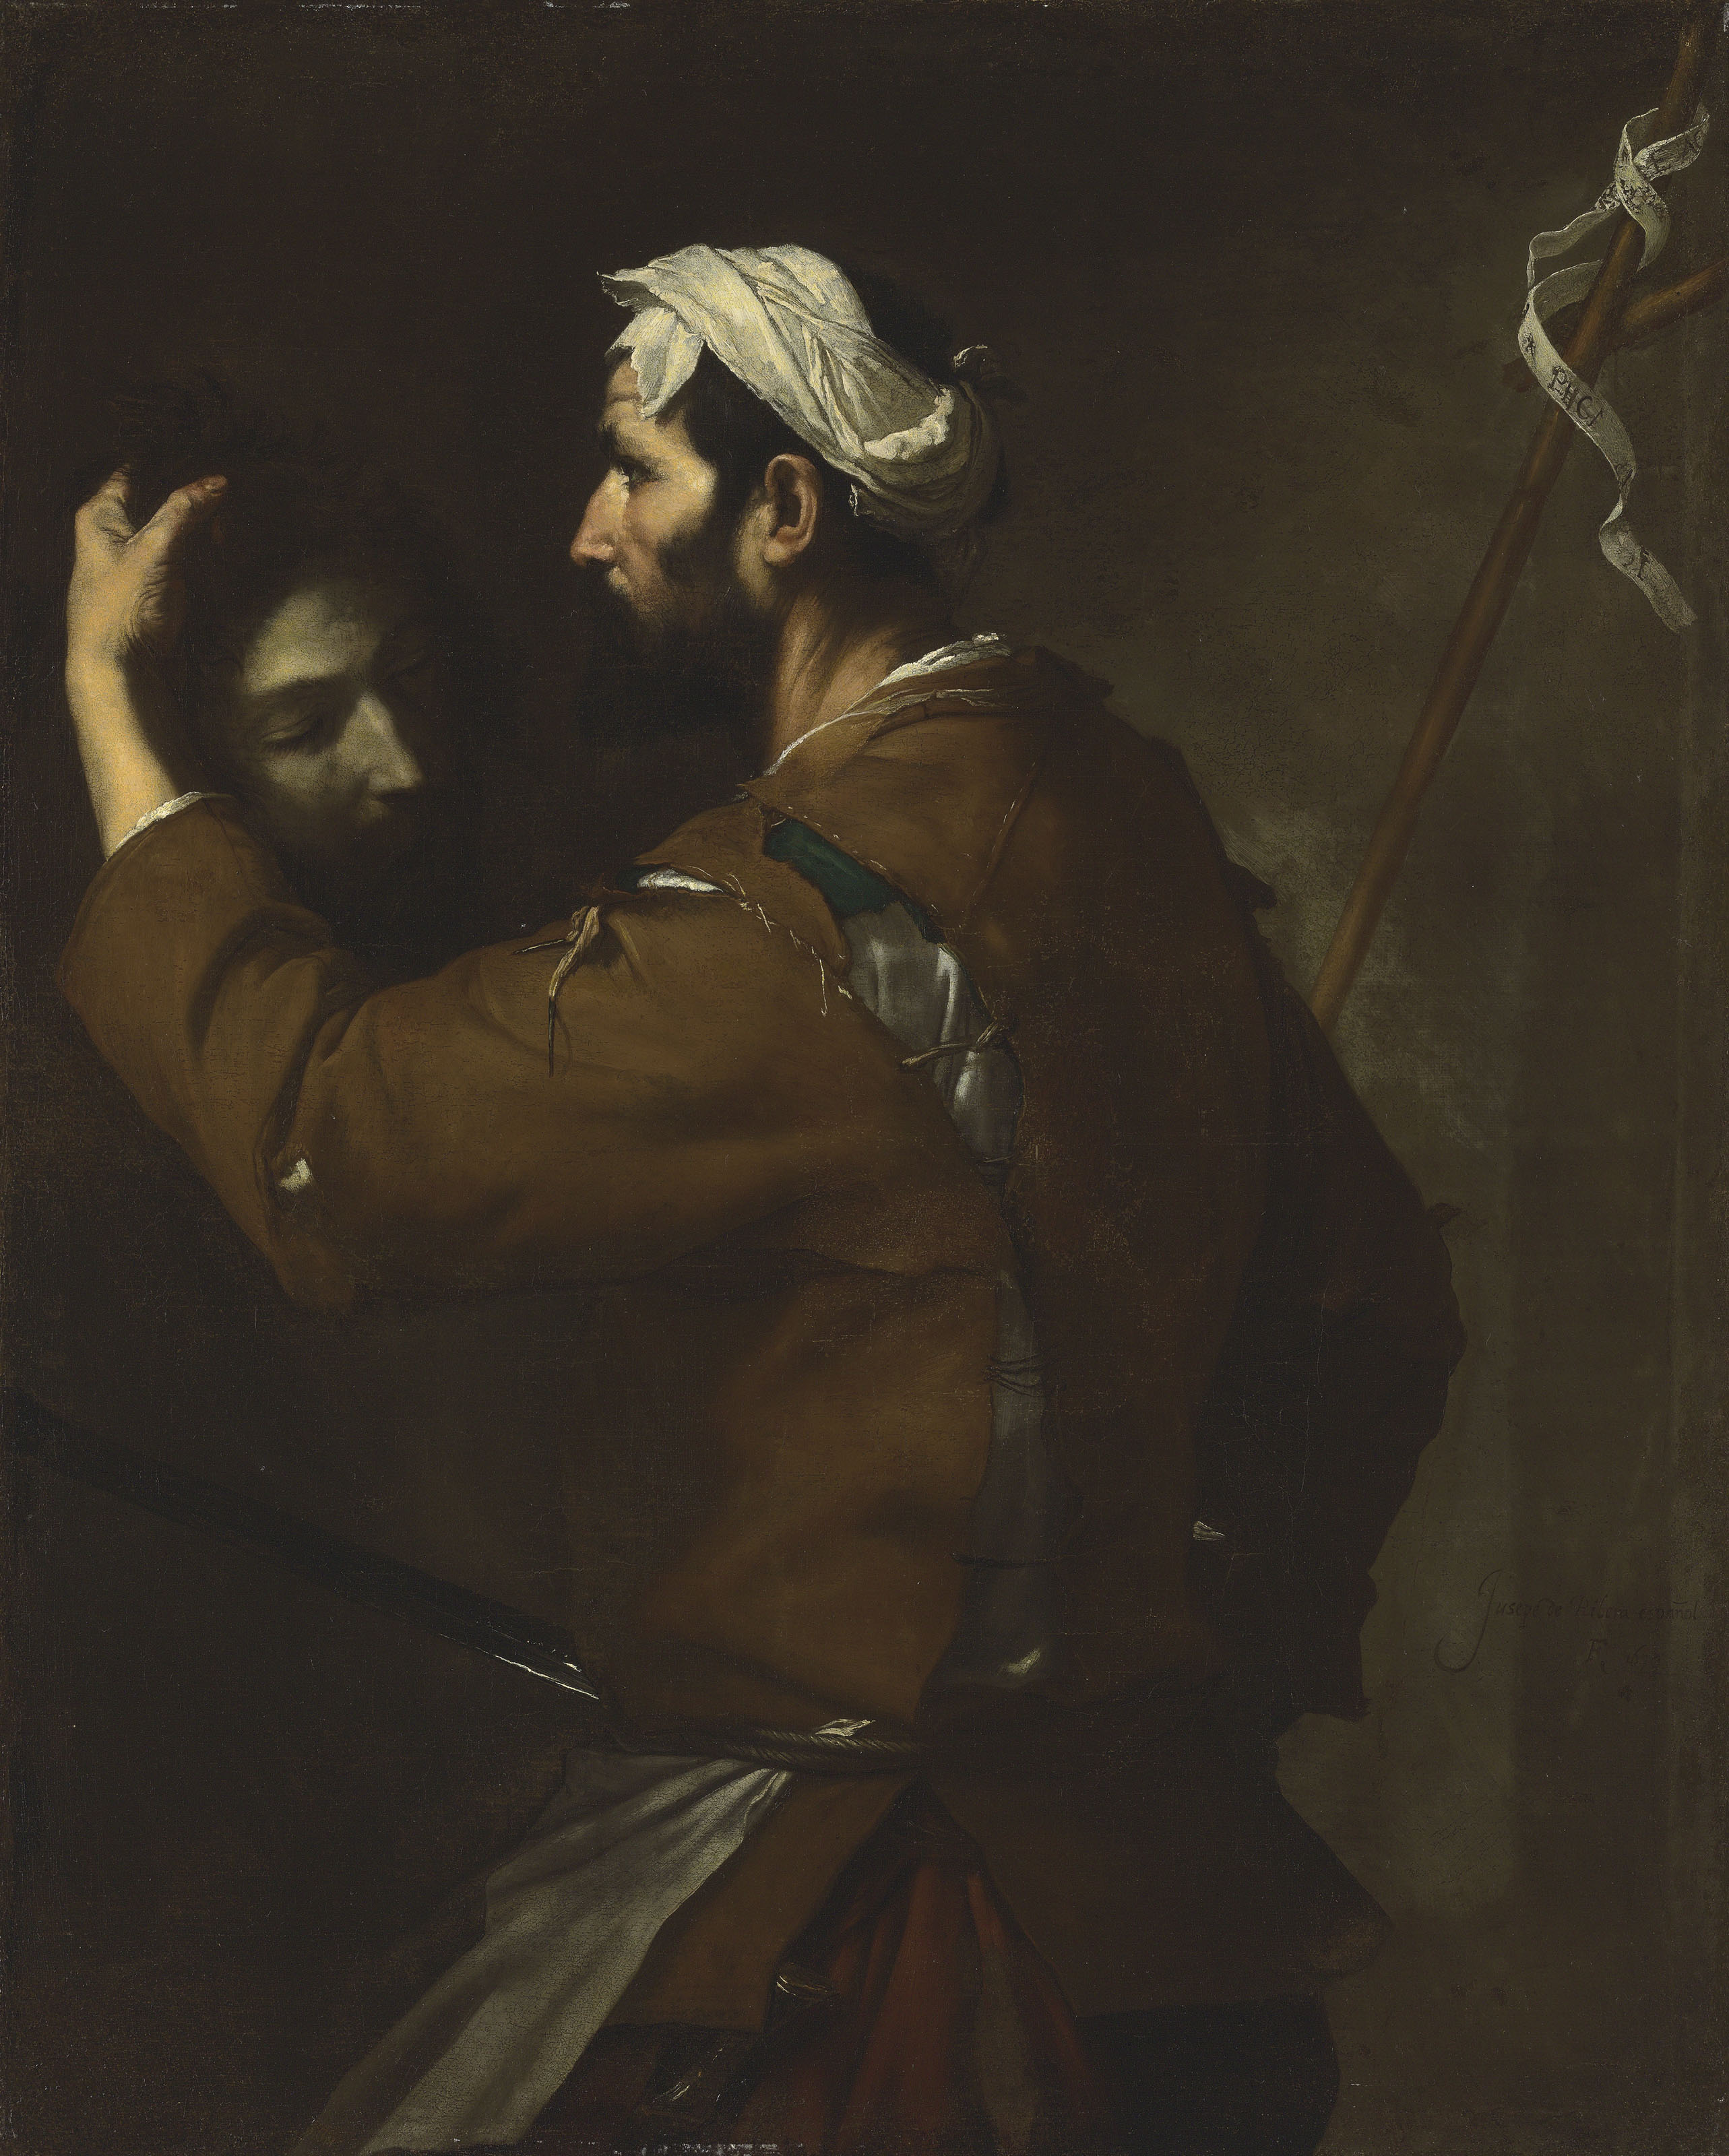 Jusepe de Ribera (Xàtiva 1591-1652 Naples)